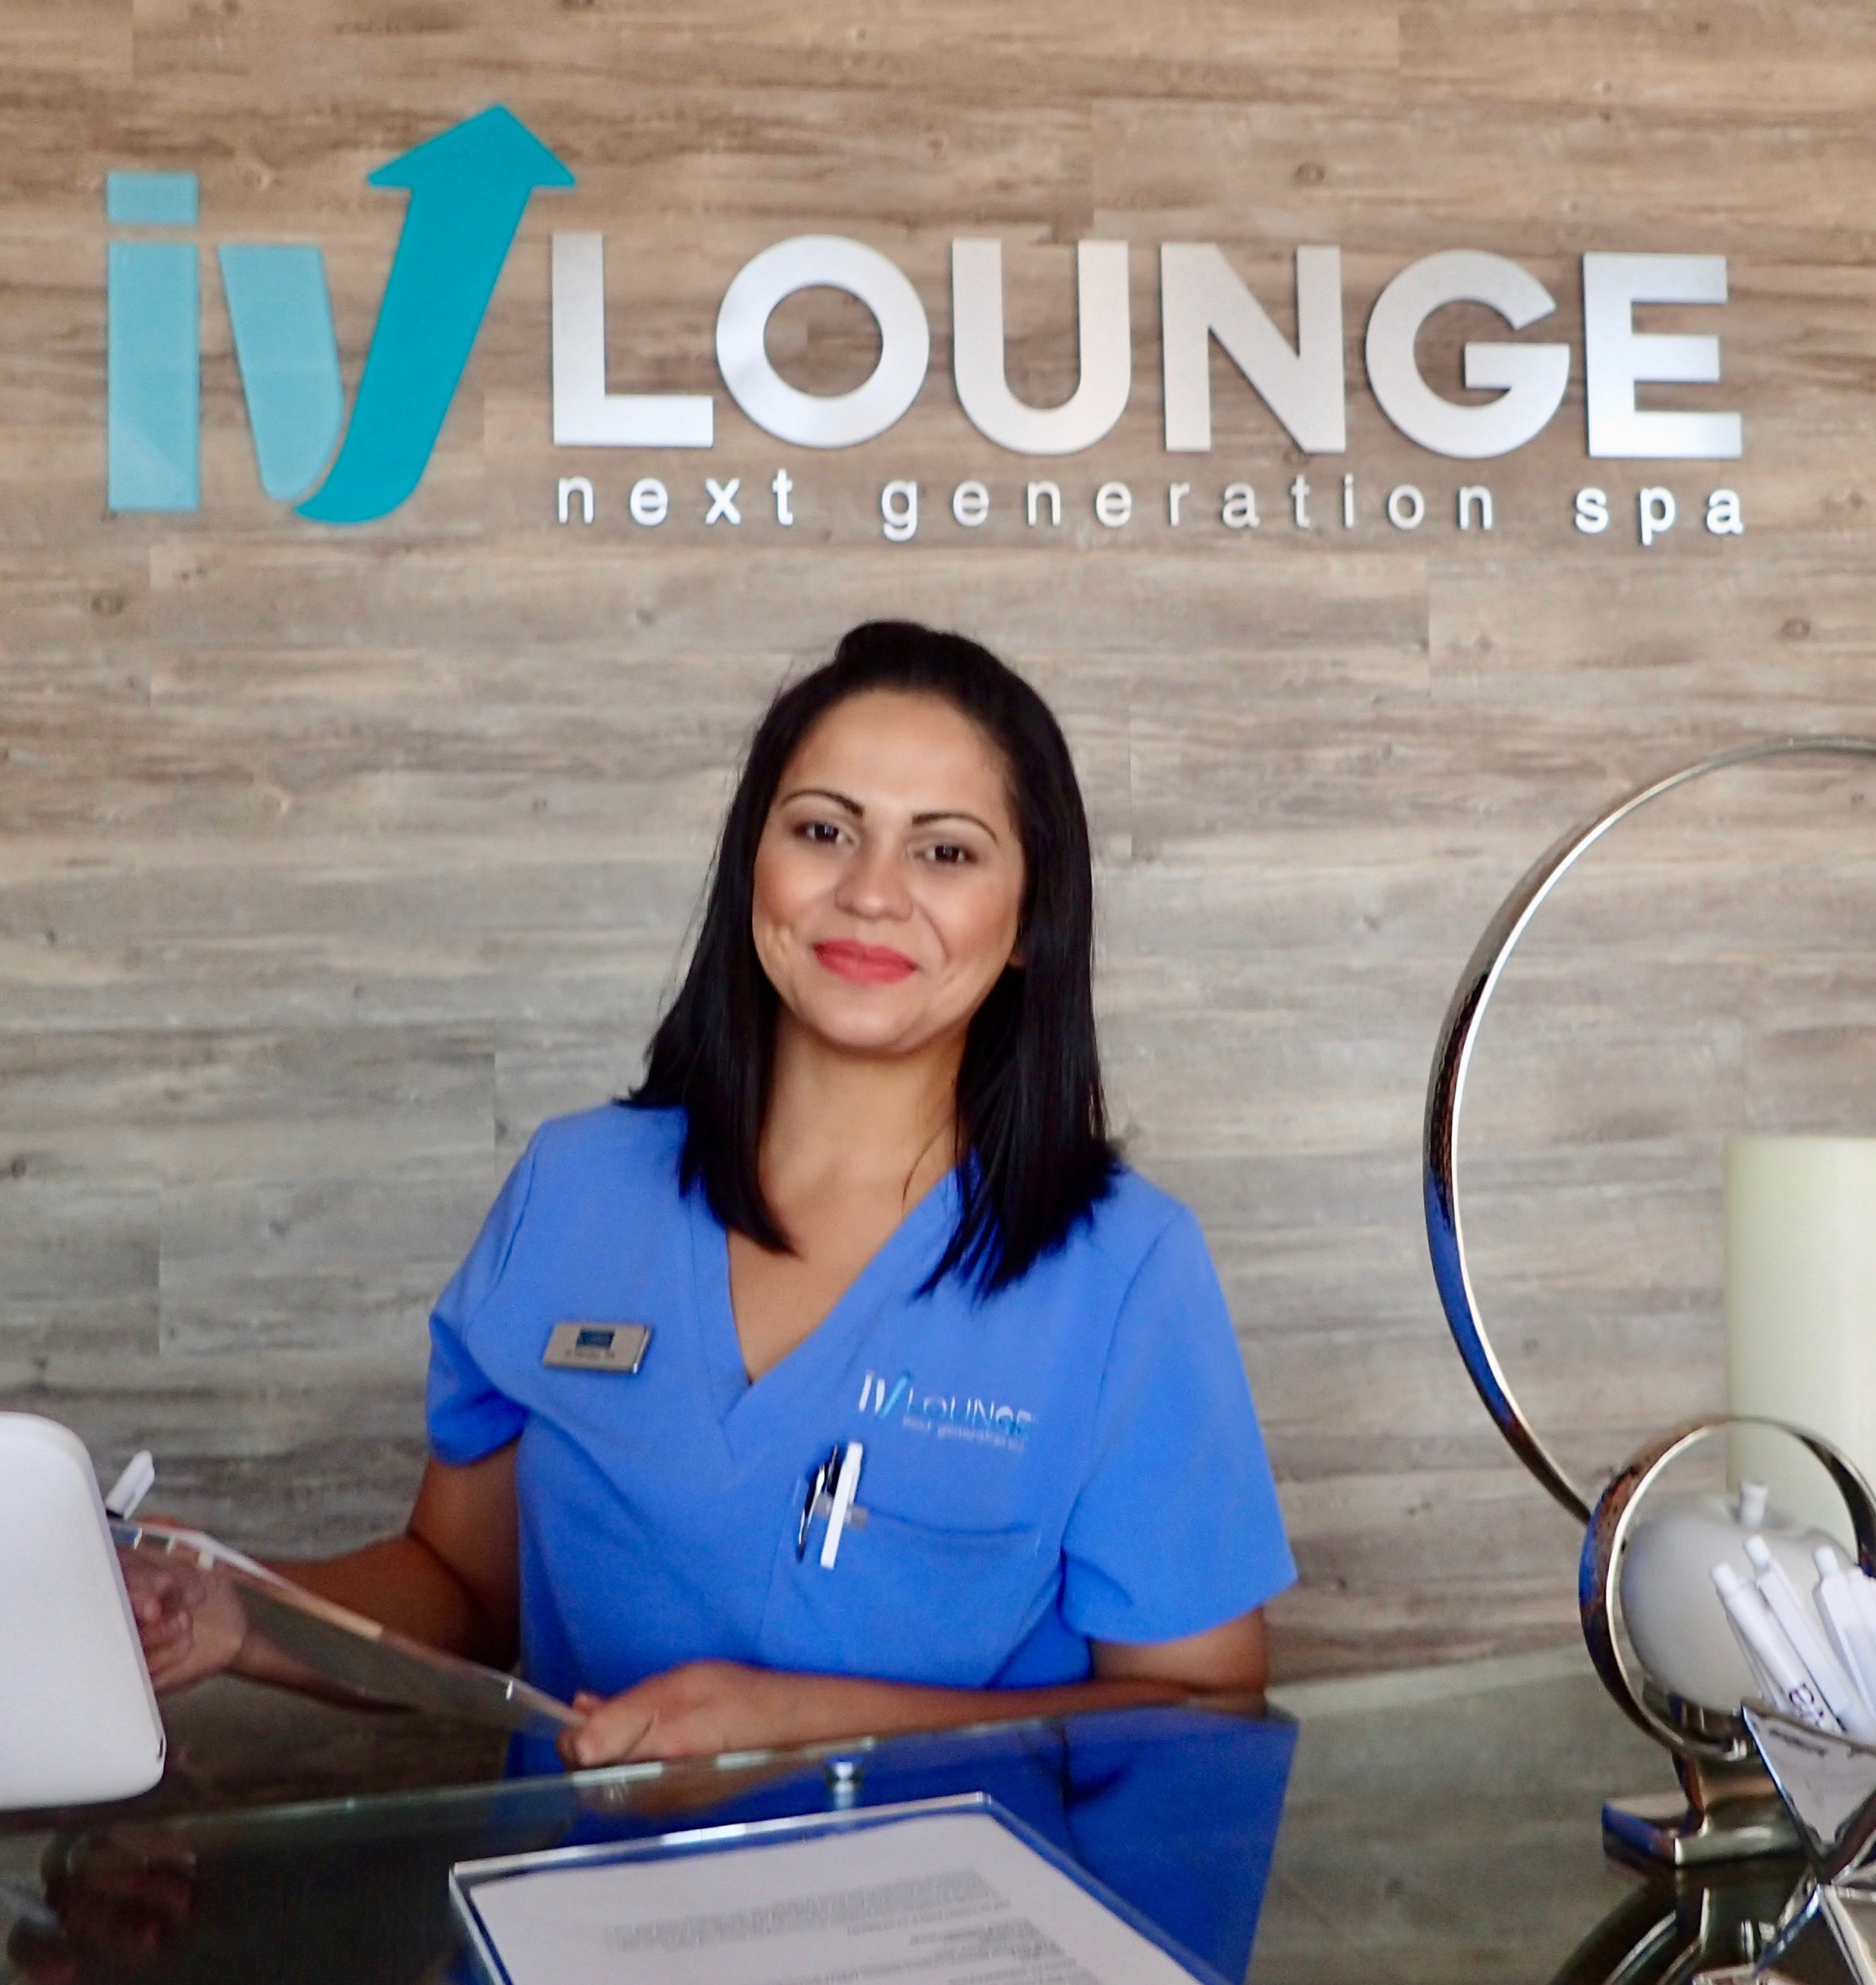 An IV Lounge: Next Generation Spa nurse